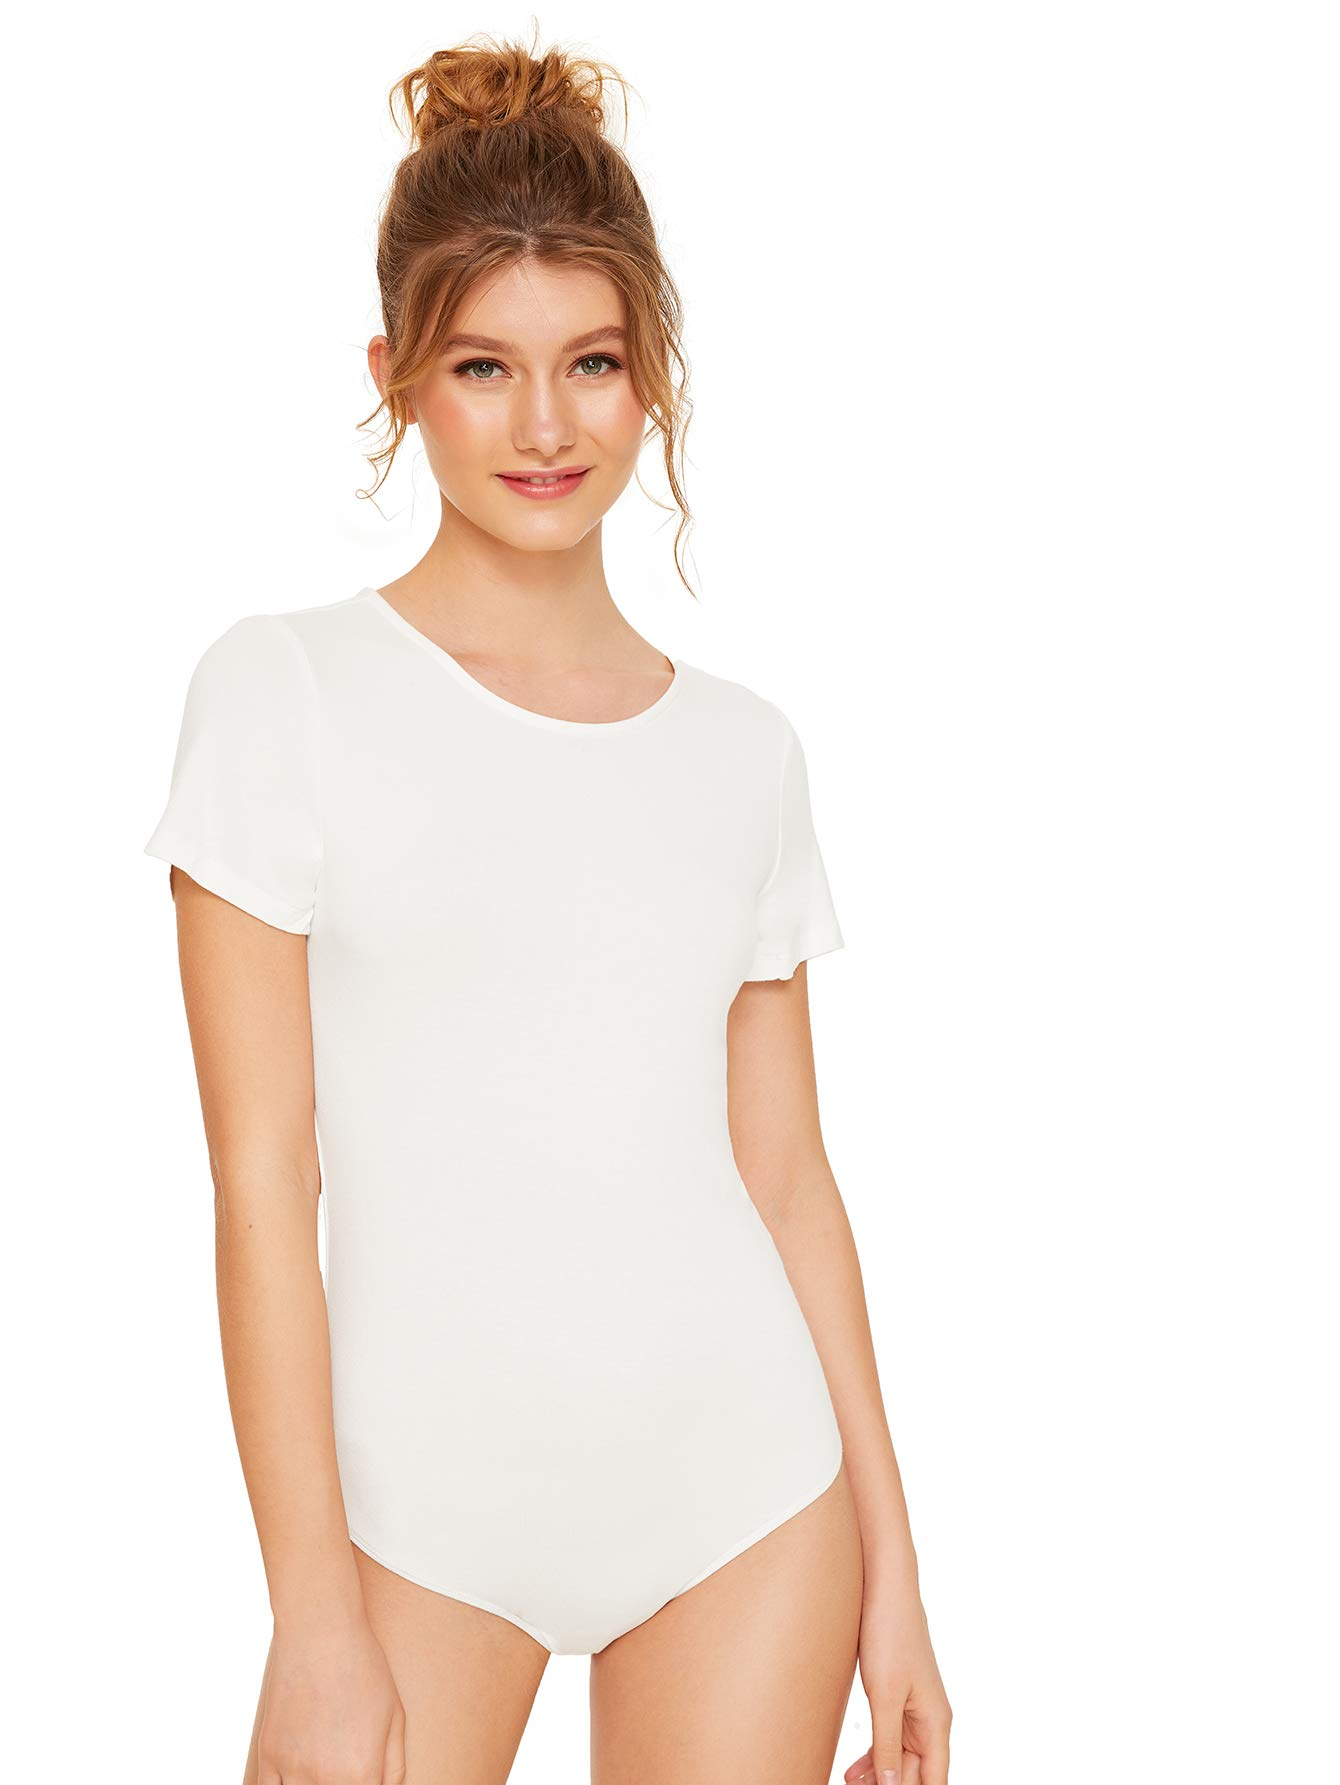 Makemechic Womens Basic Short Sleeve Stretchy Bodysuit Leotard Tops White M